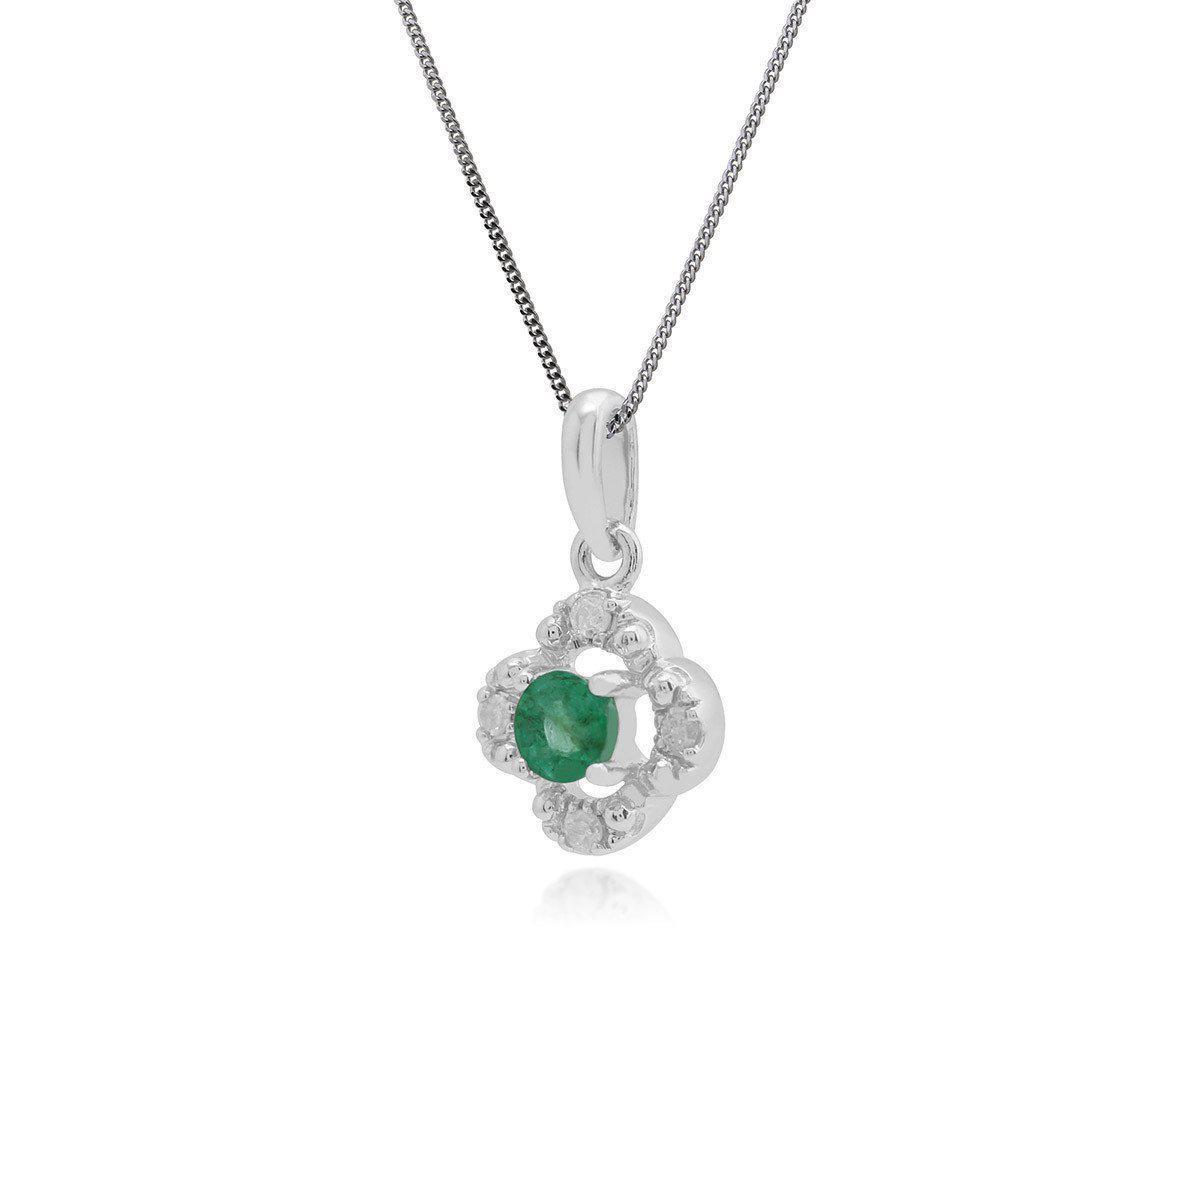 Gemondo Jewellery Emerald And Diamond Quatrefoil Pendant Necklace in Metallic